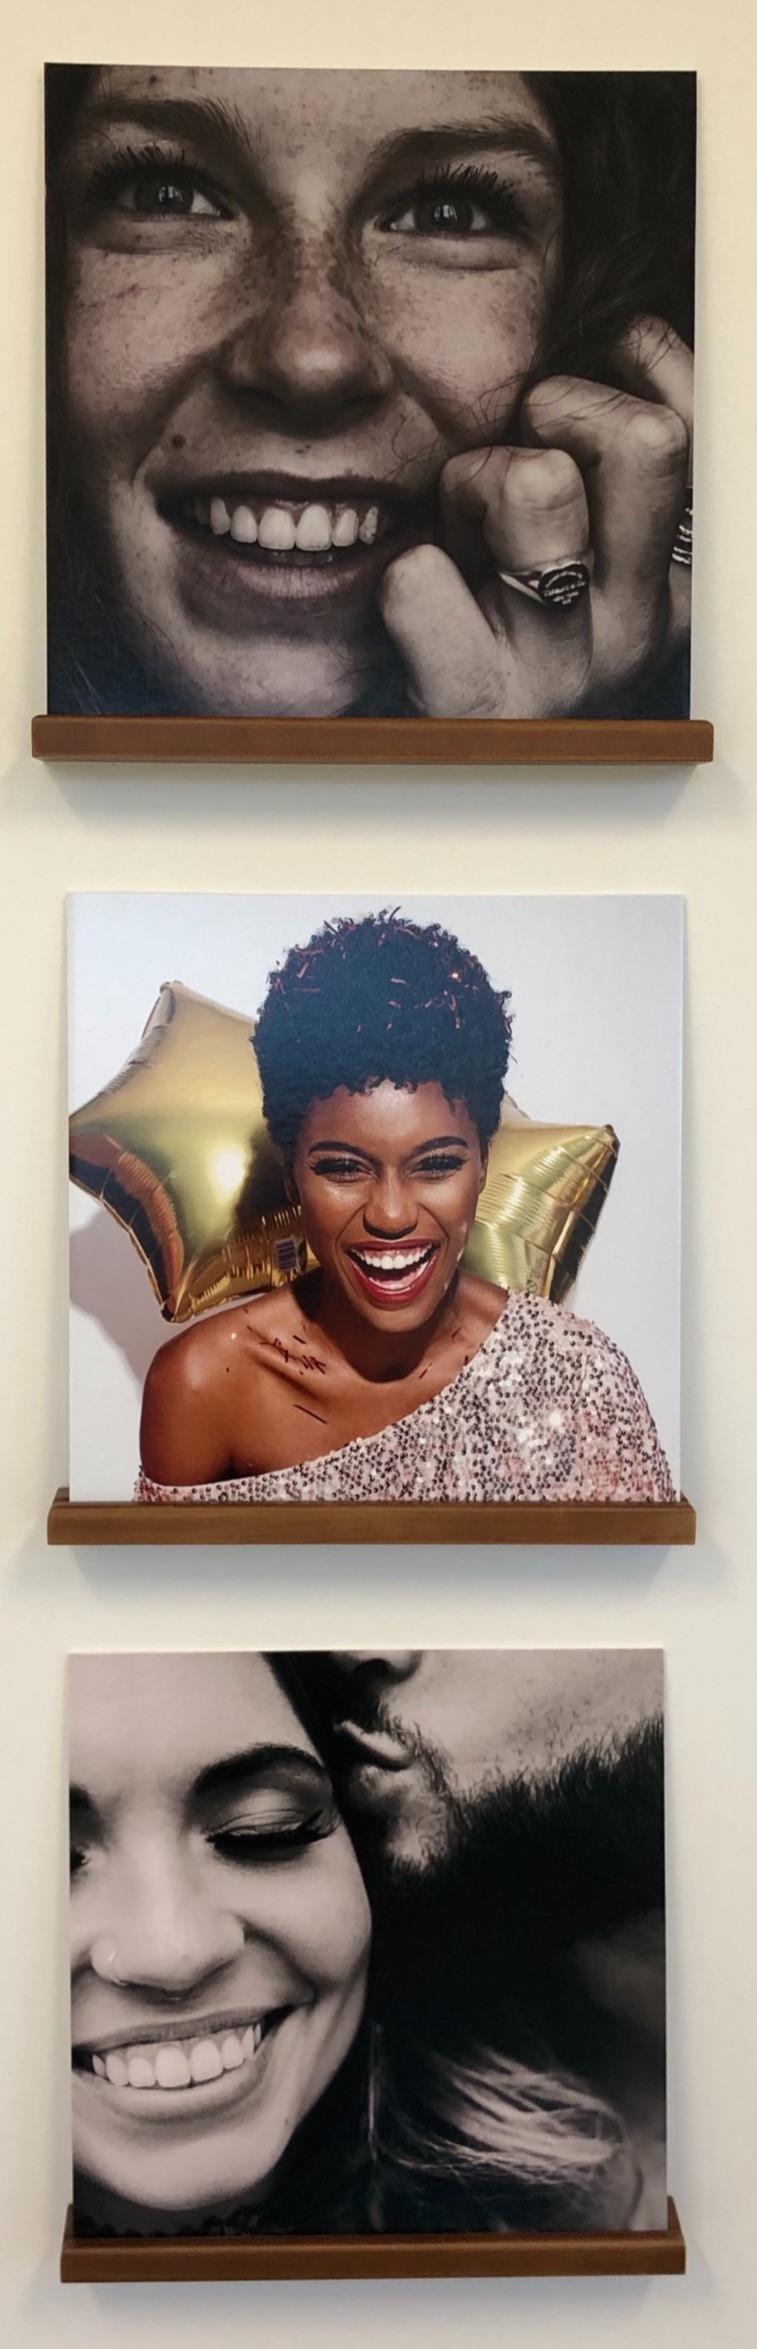 Genuine Orthodontics smile photo wall